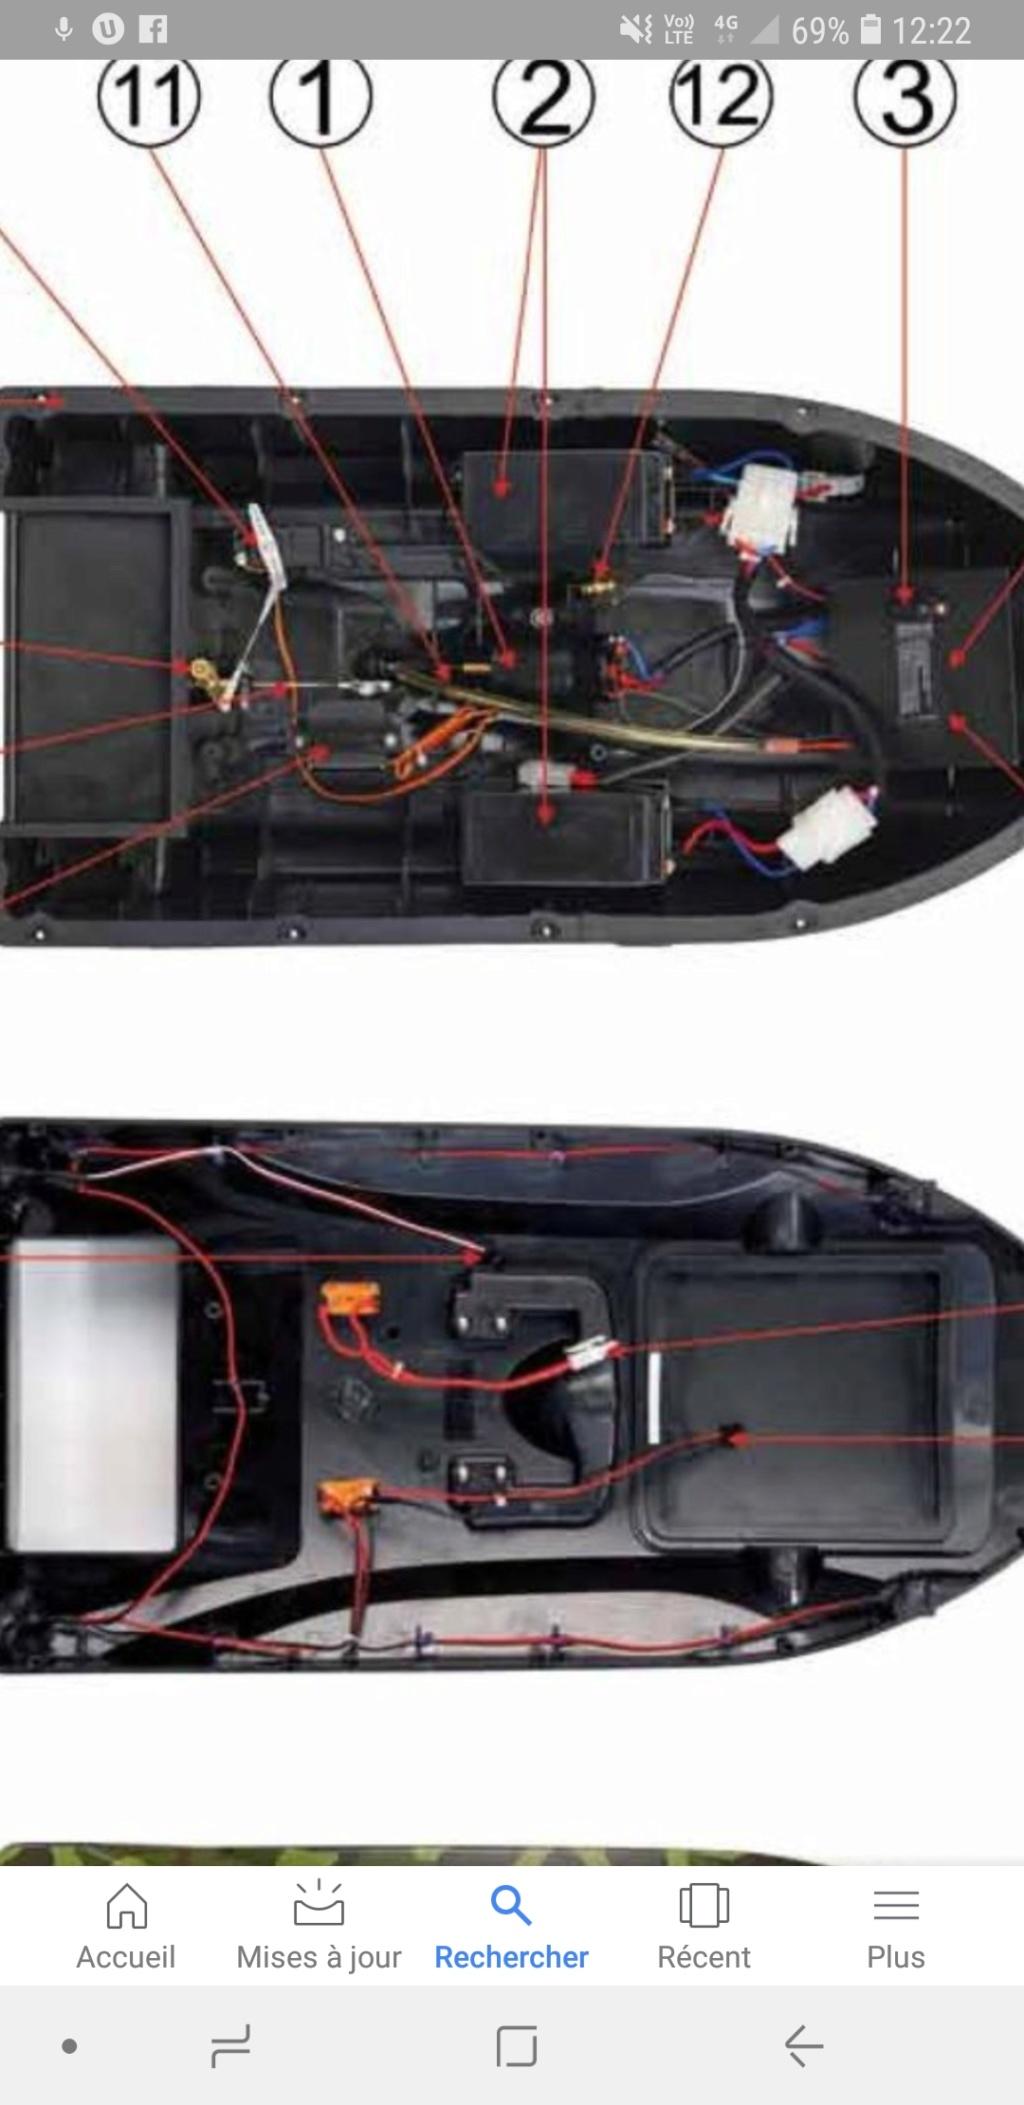 Le tout nouveau Variateur Hobbywing QuicRun 1080 Waterproof Brushed 80A Programmable Screen11